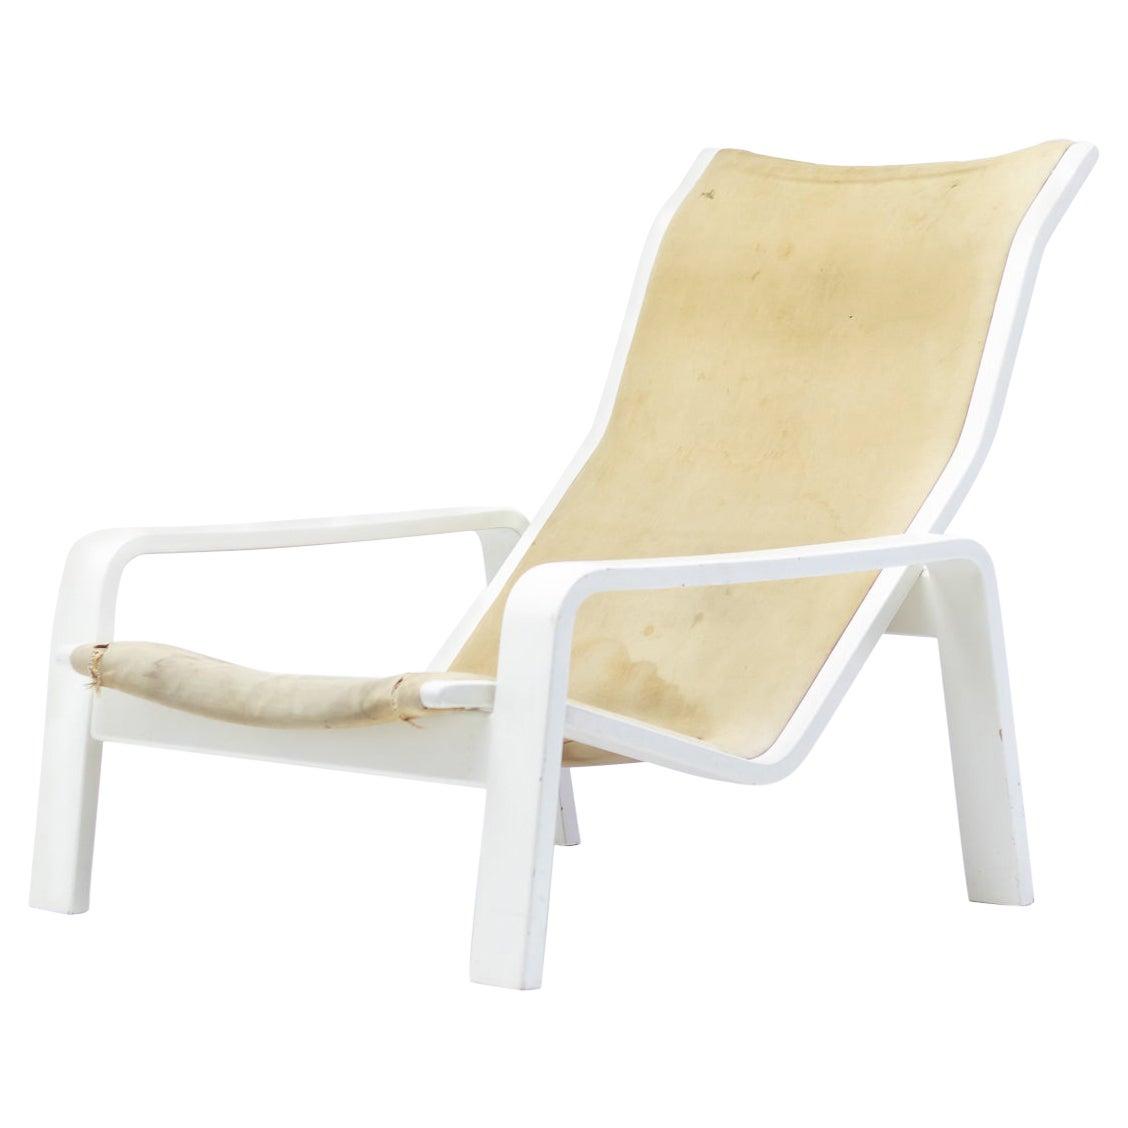 Pulkka Lounge Chair by Ilmari Lappalainen for Asko